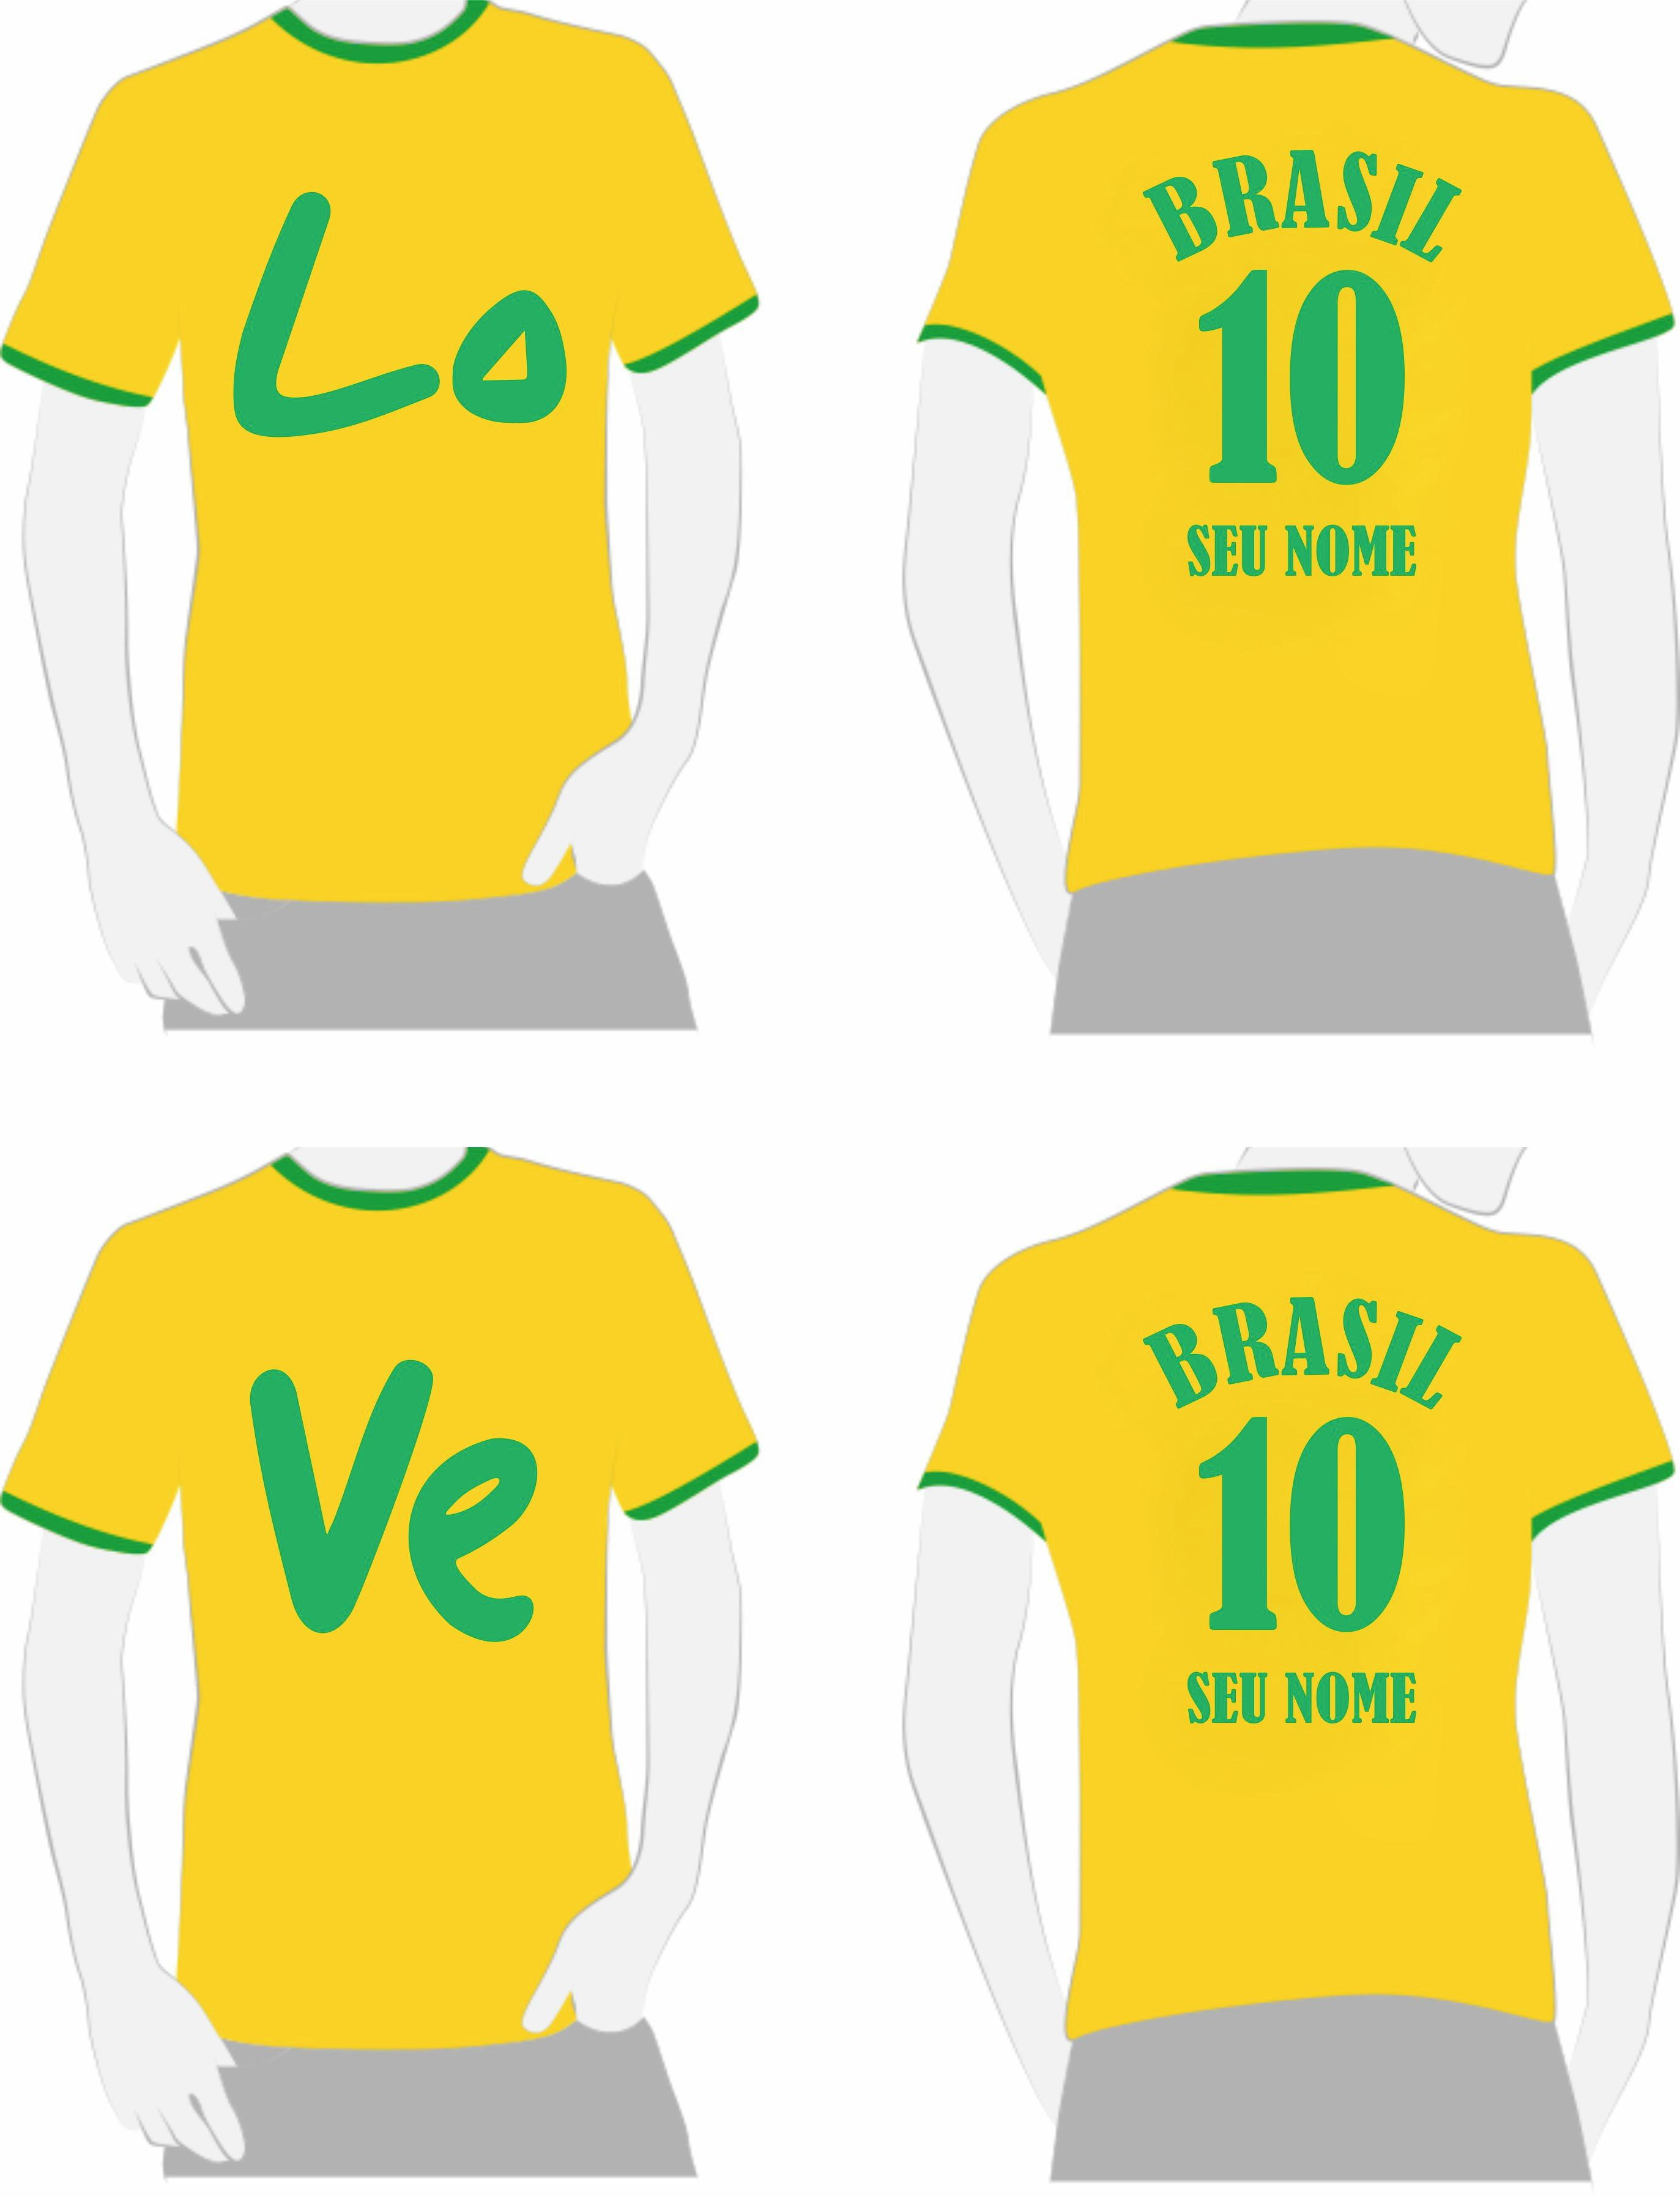 25e2df2b9f6e3 Camisetas Love Casal Namorados Copa do Mundo | Elo7